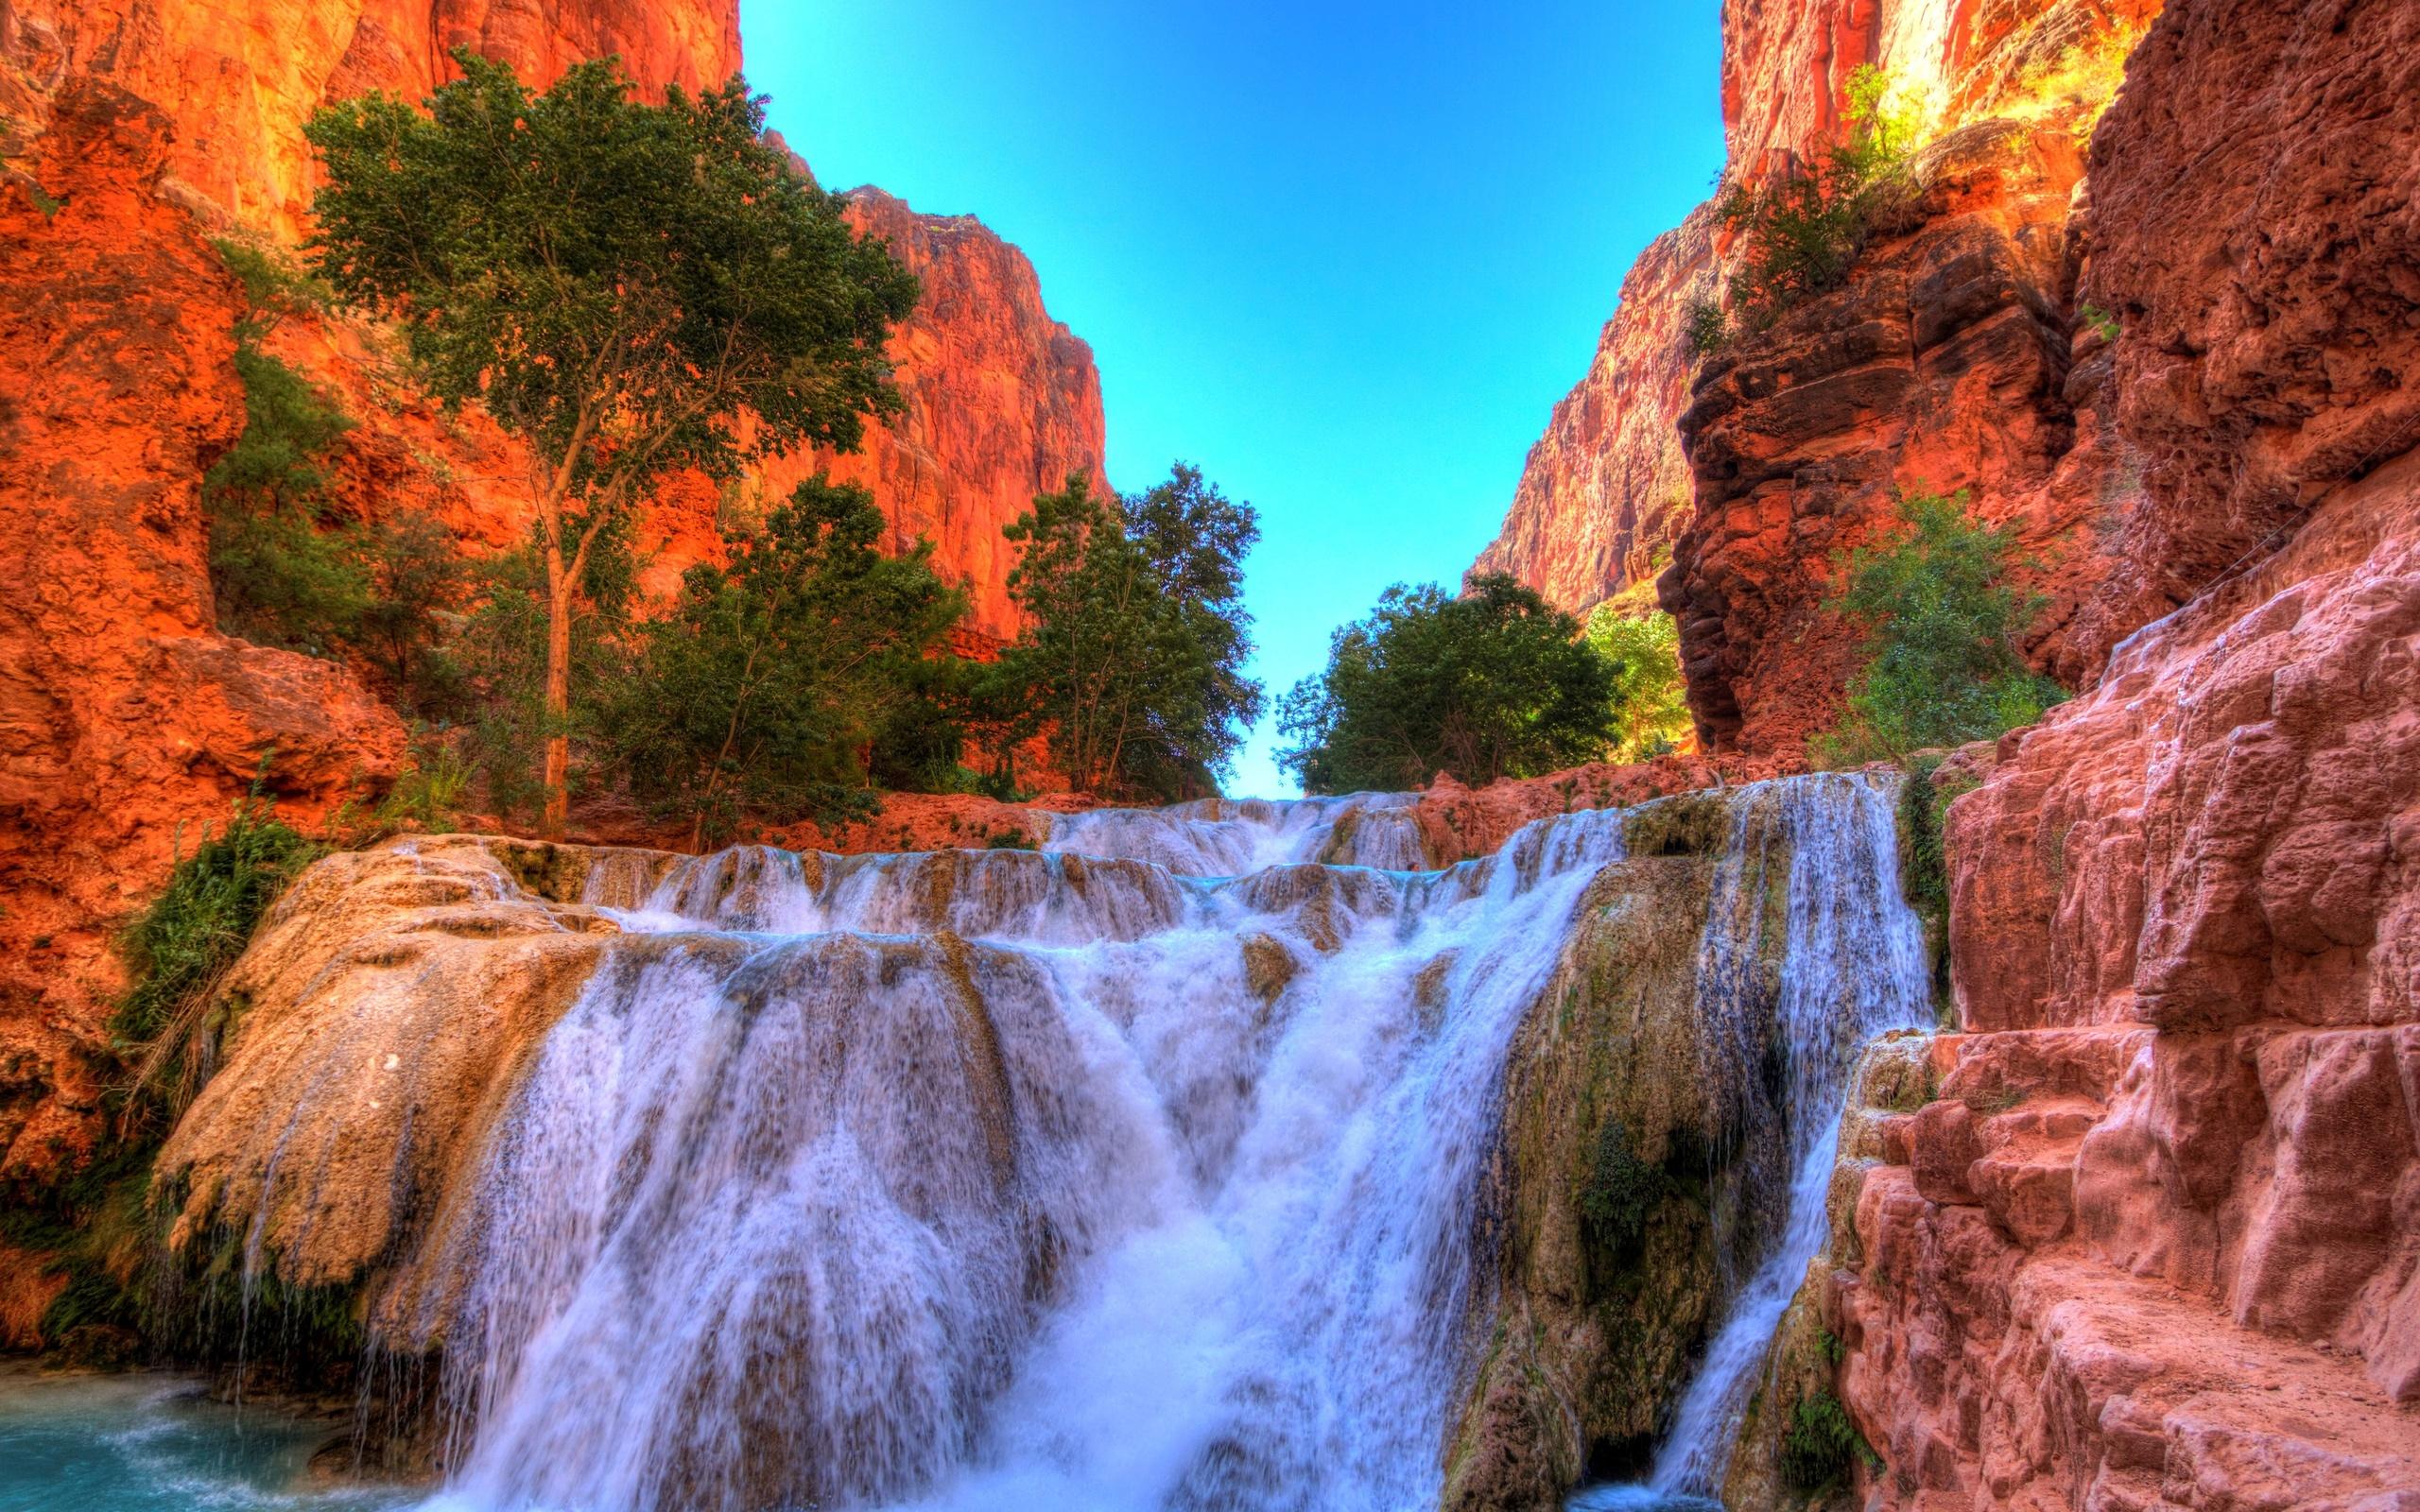 водопад, grand, falls, arizona, little, colorado, river, деревья, скала, природа